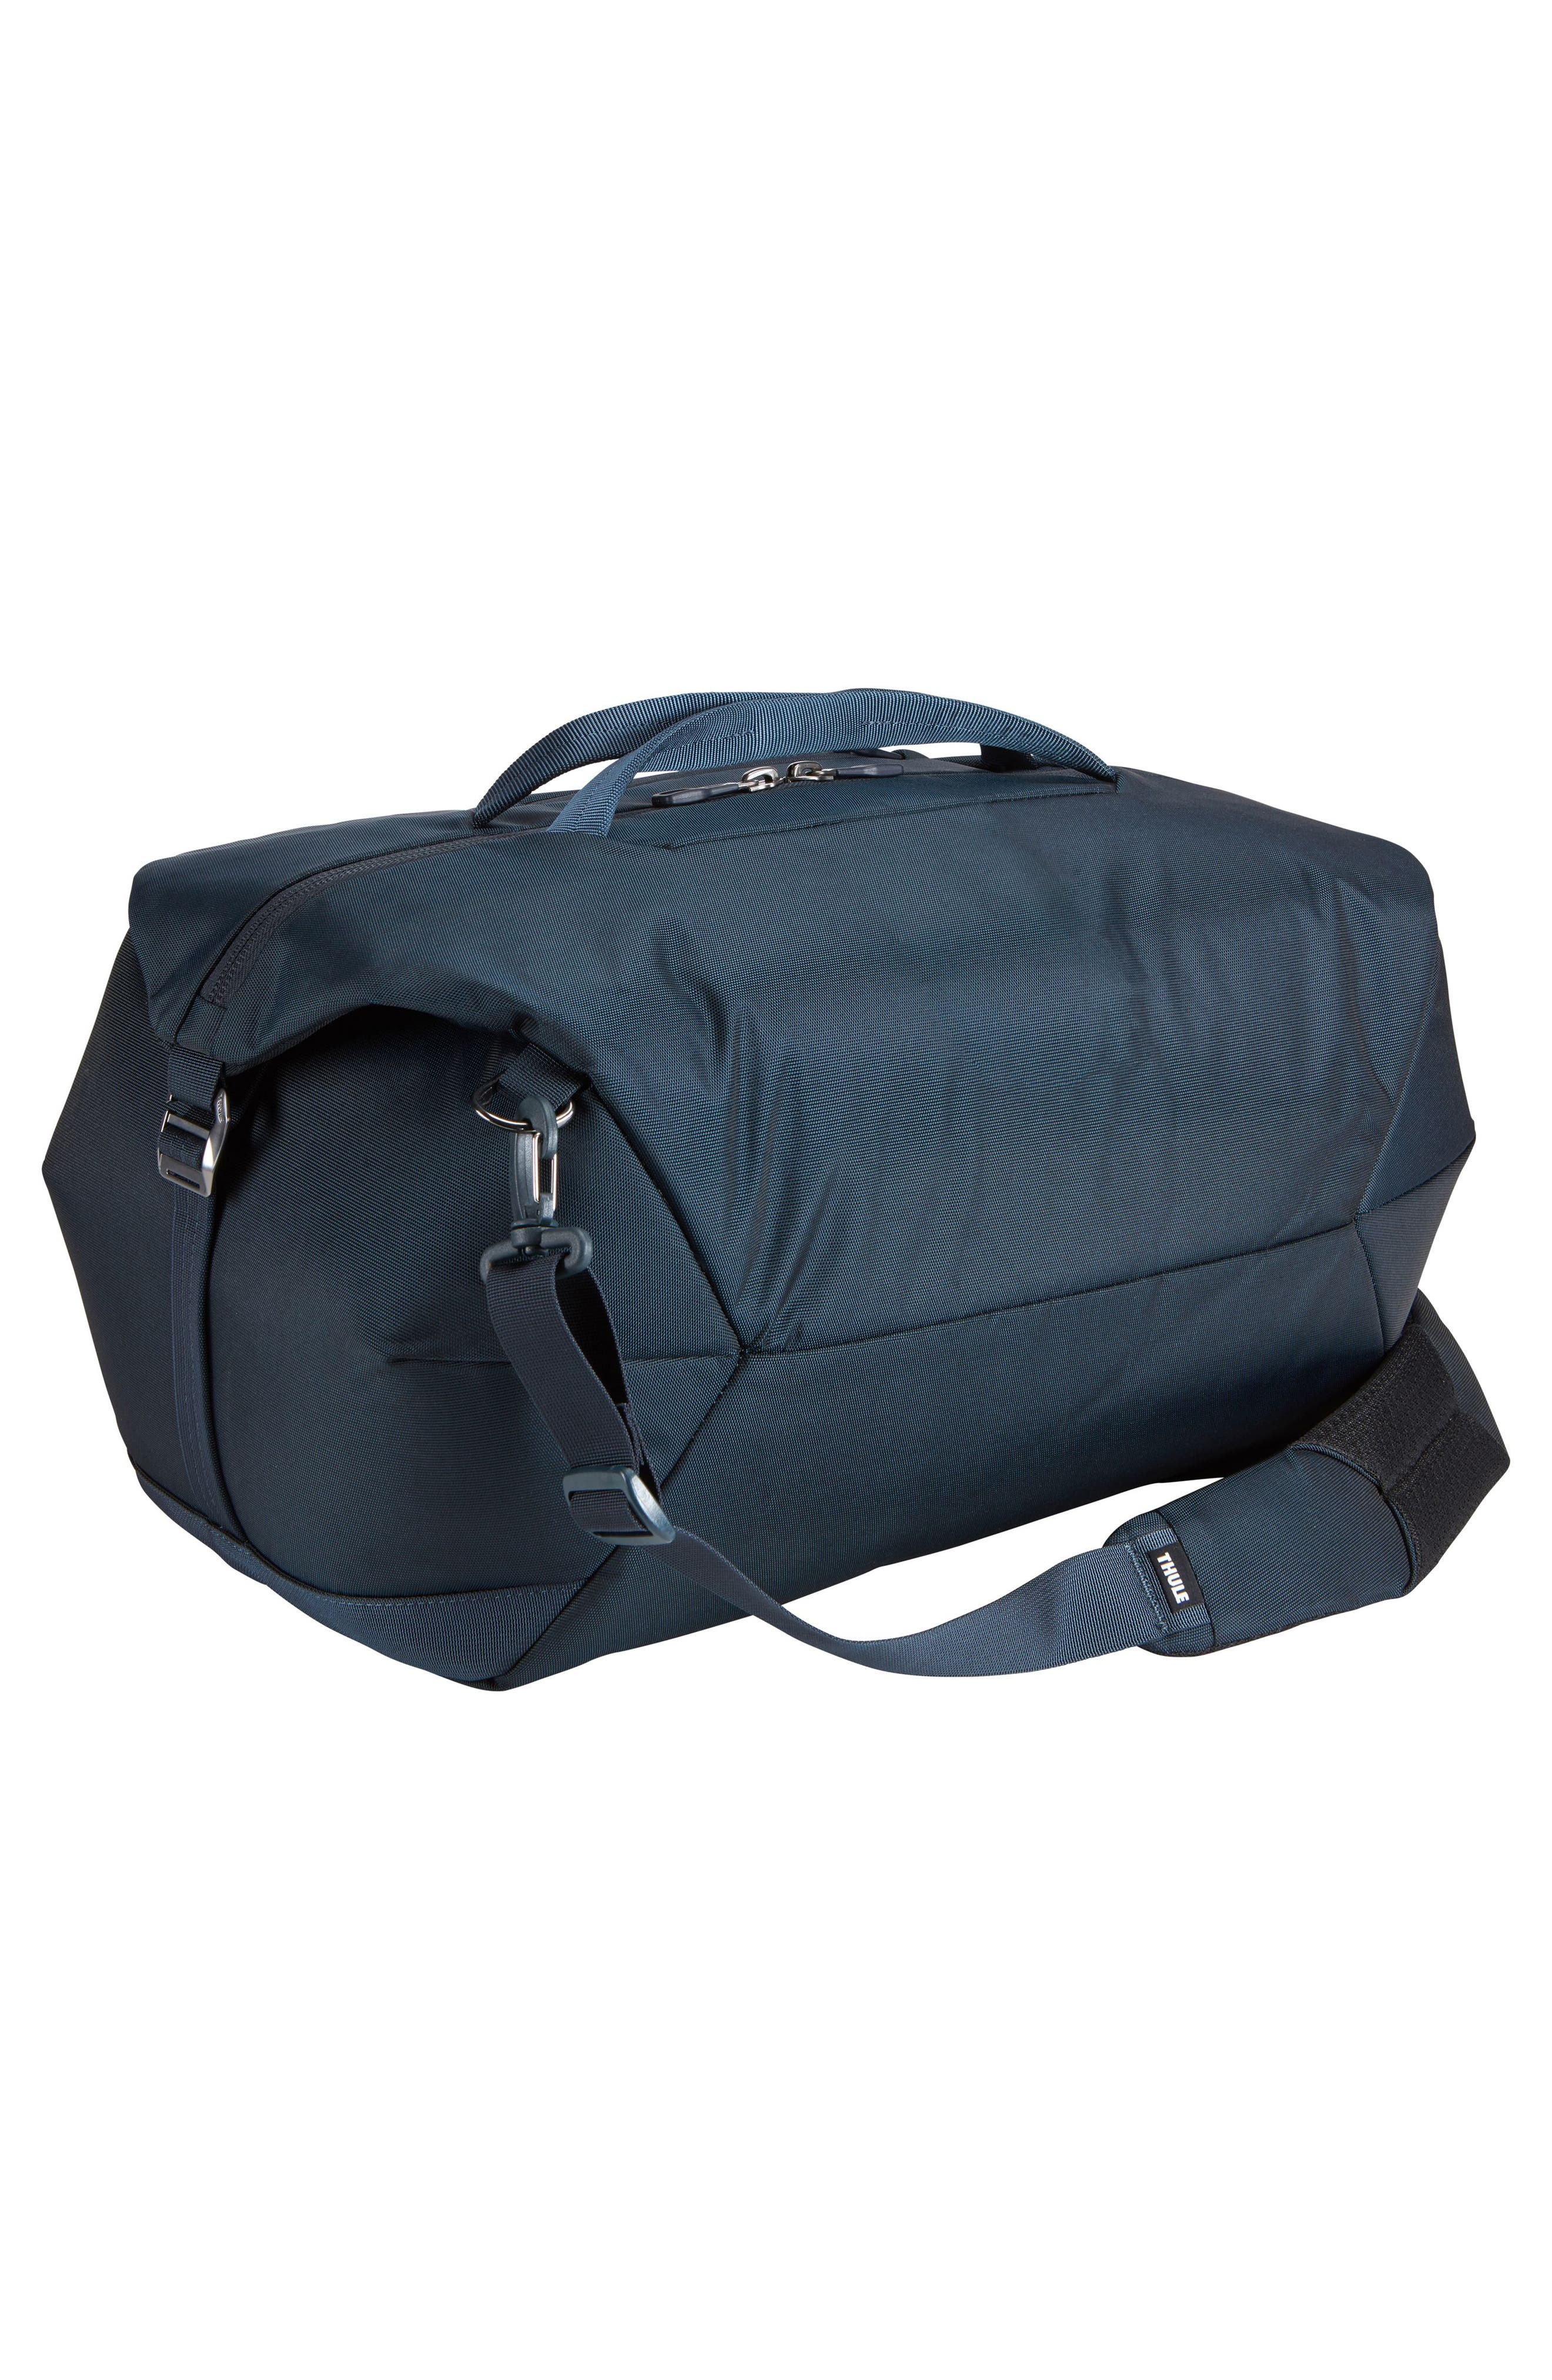 Subterra 40-Liter Convertible Duffel Bag,                             Alternate thumbnail 4, color,